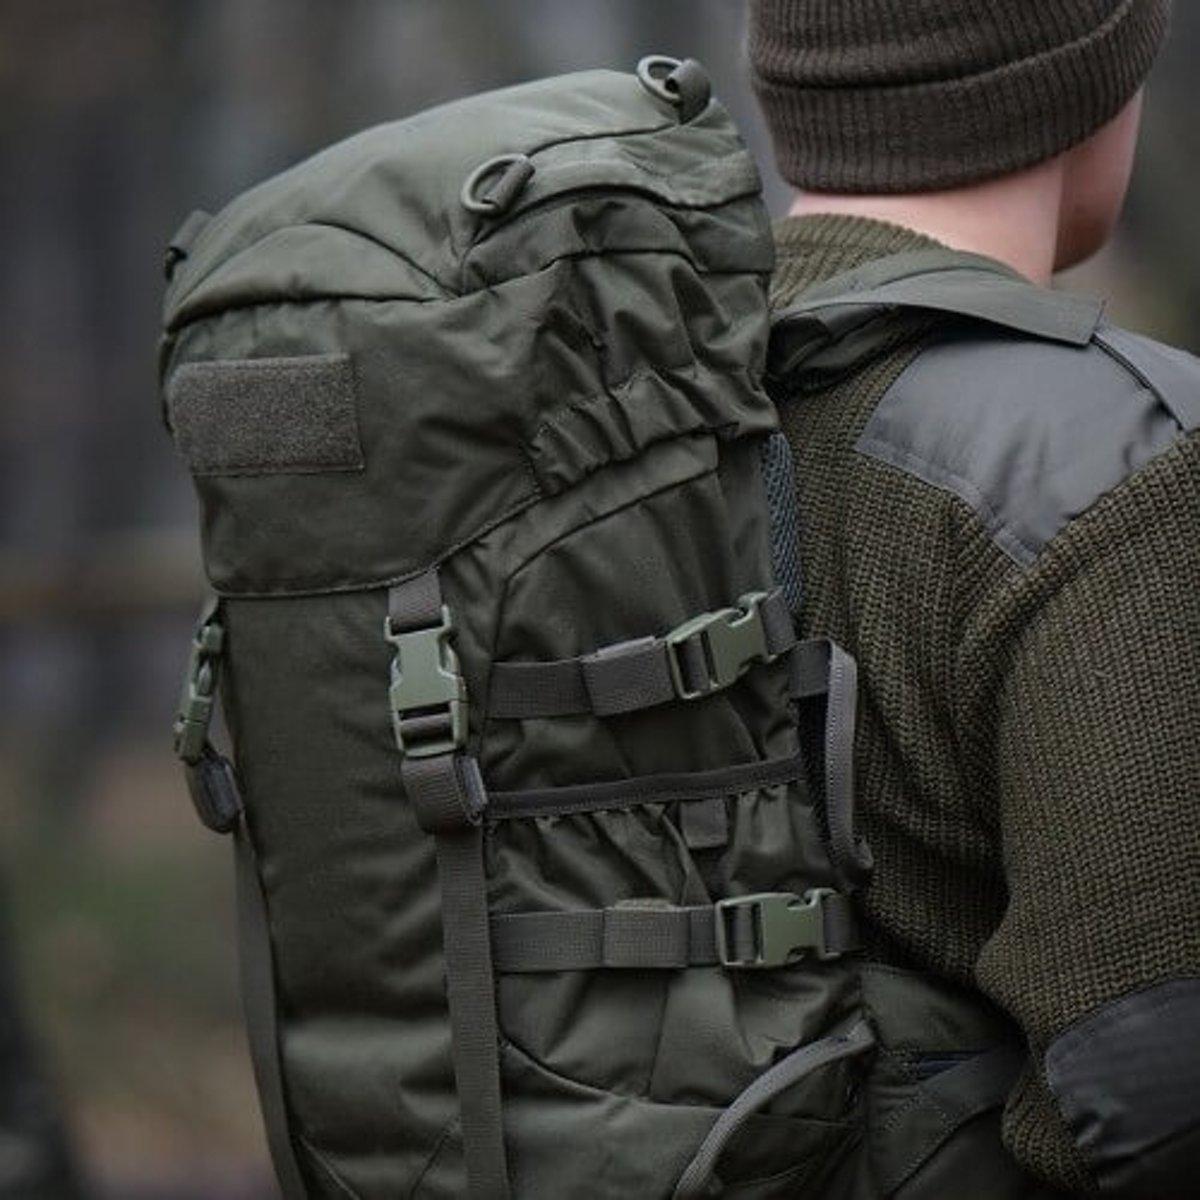 b8aeceac954 bol.com | 101 Inc Pro-Line Crossover backpack 35 liter - Black